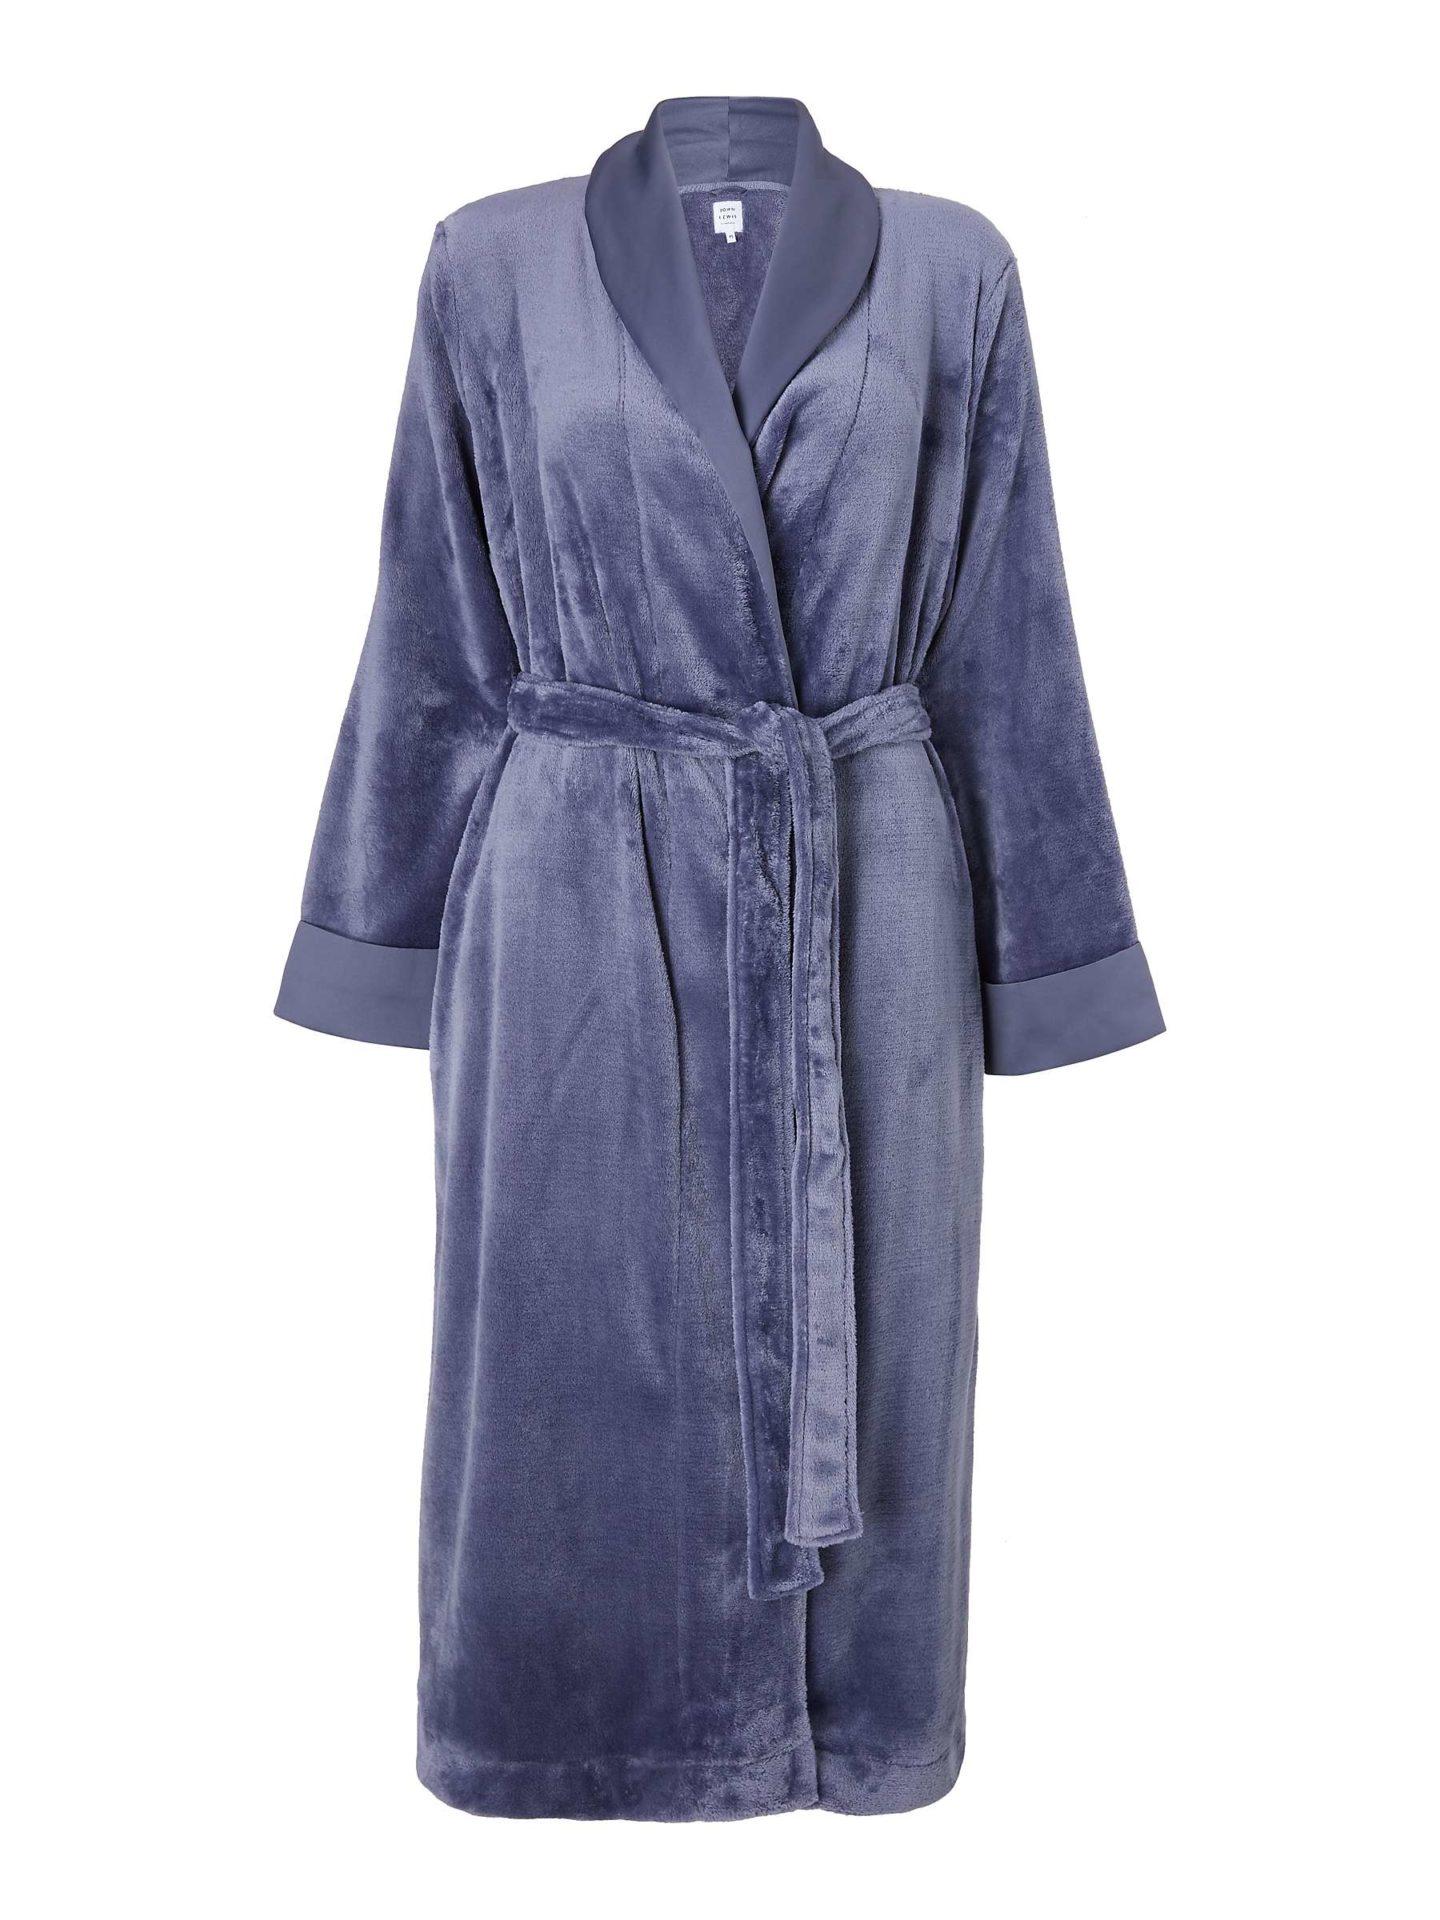 Navy blue bath robe